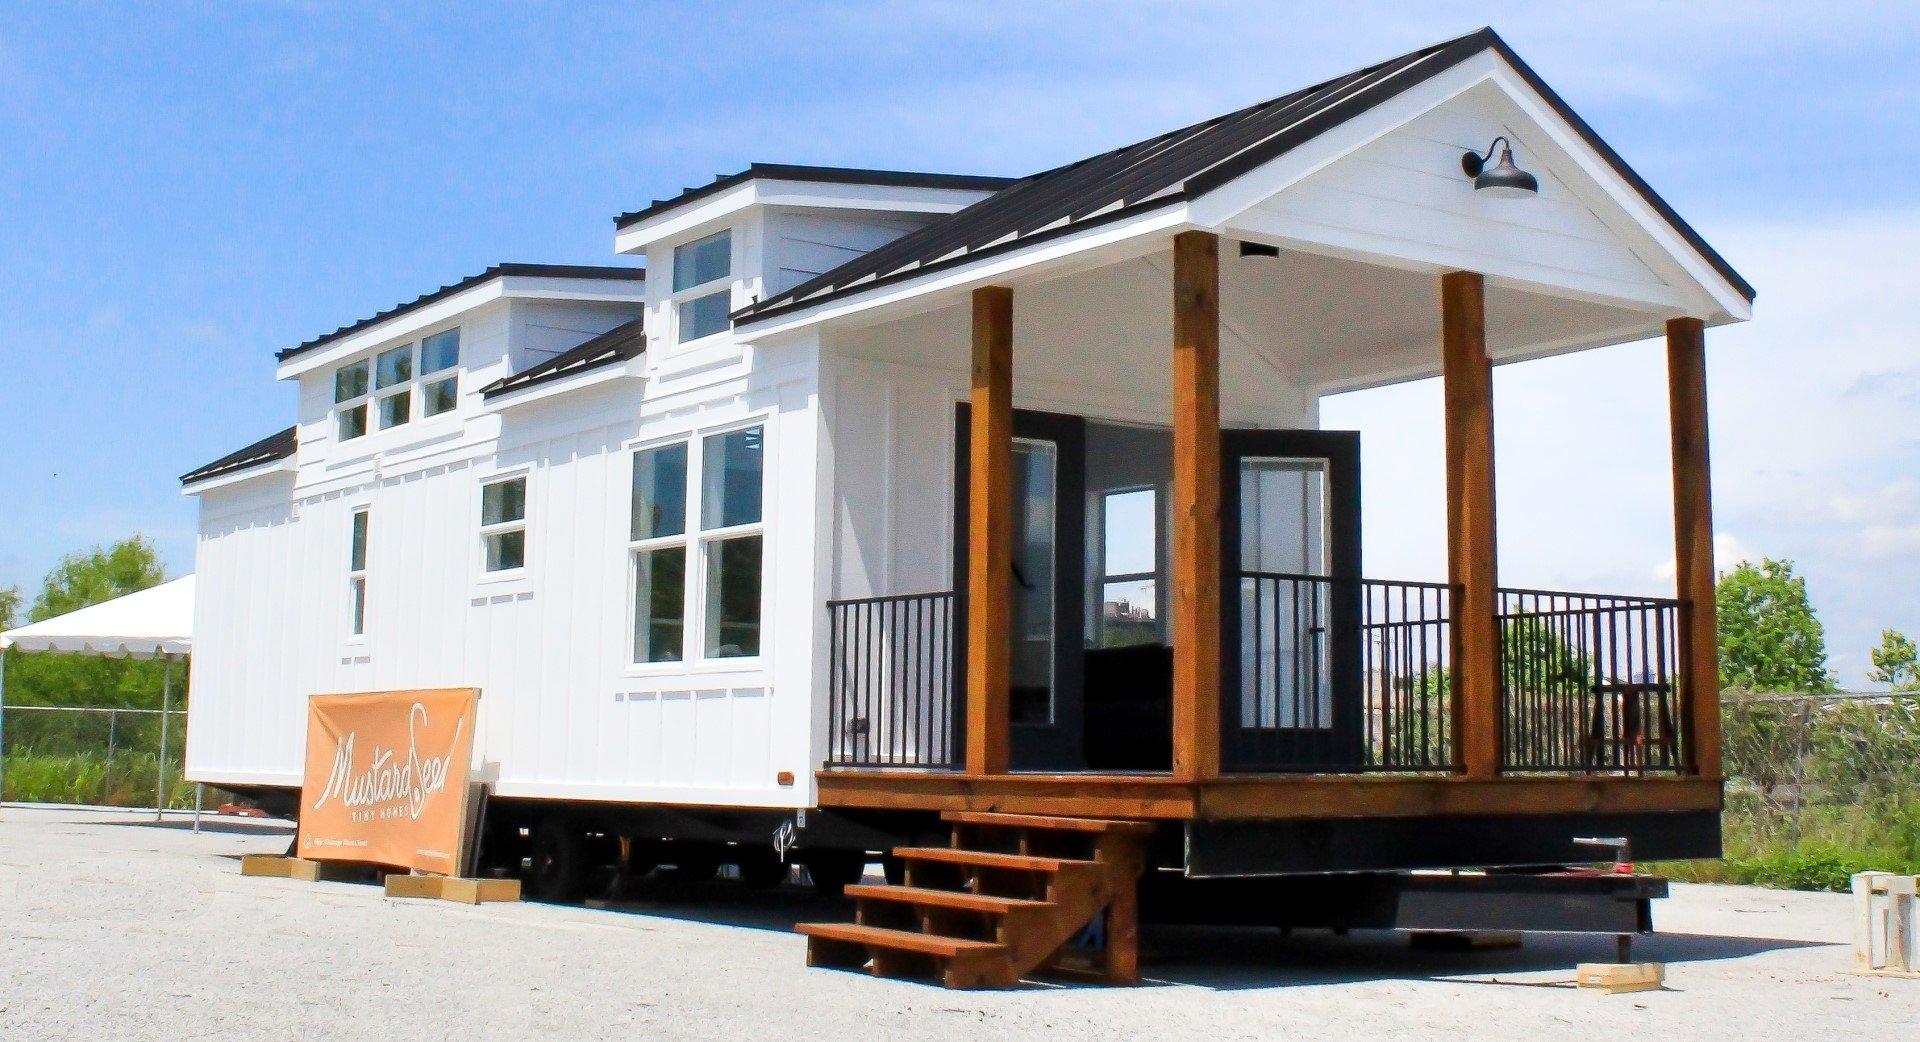 The Zion Park Model Tiny House - Mustard Seed Tiny Homes Edition